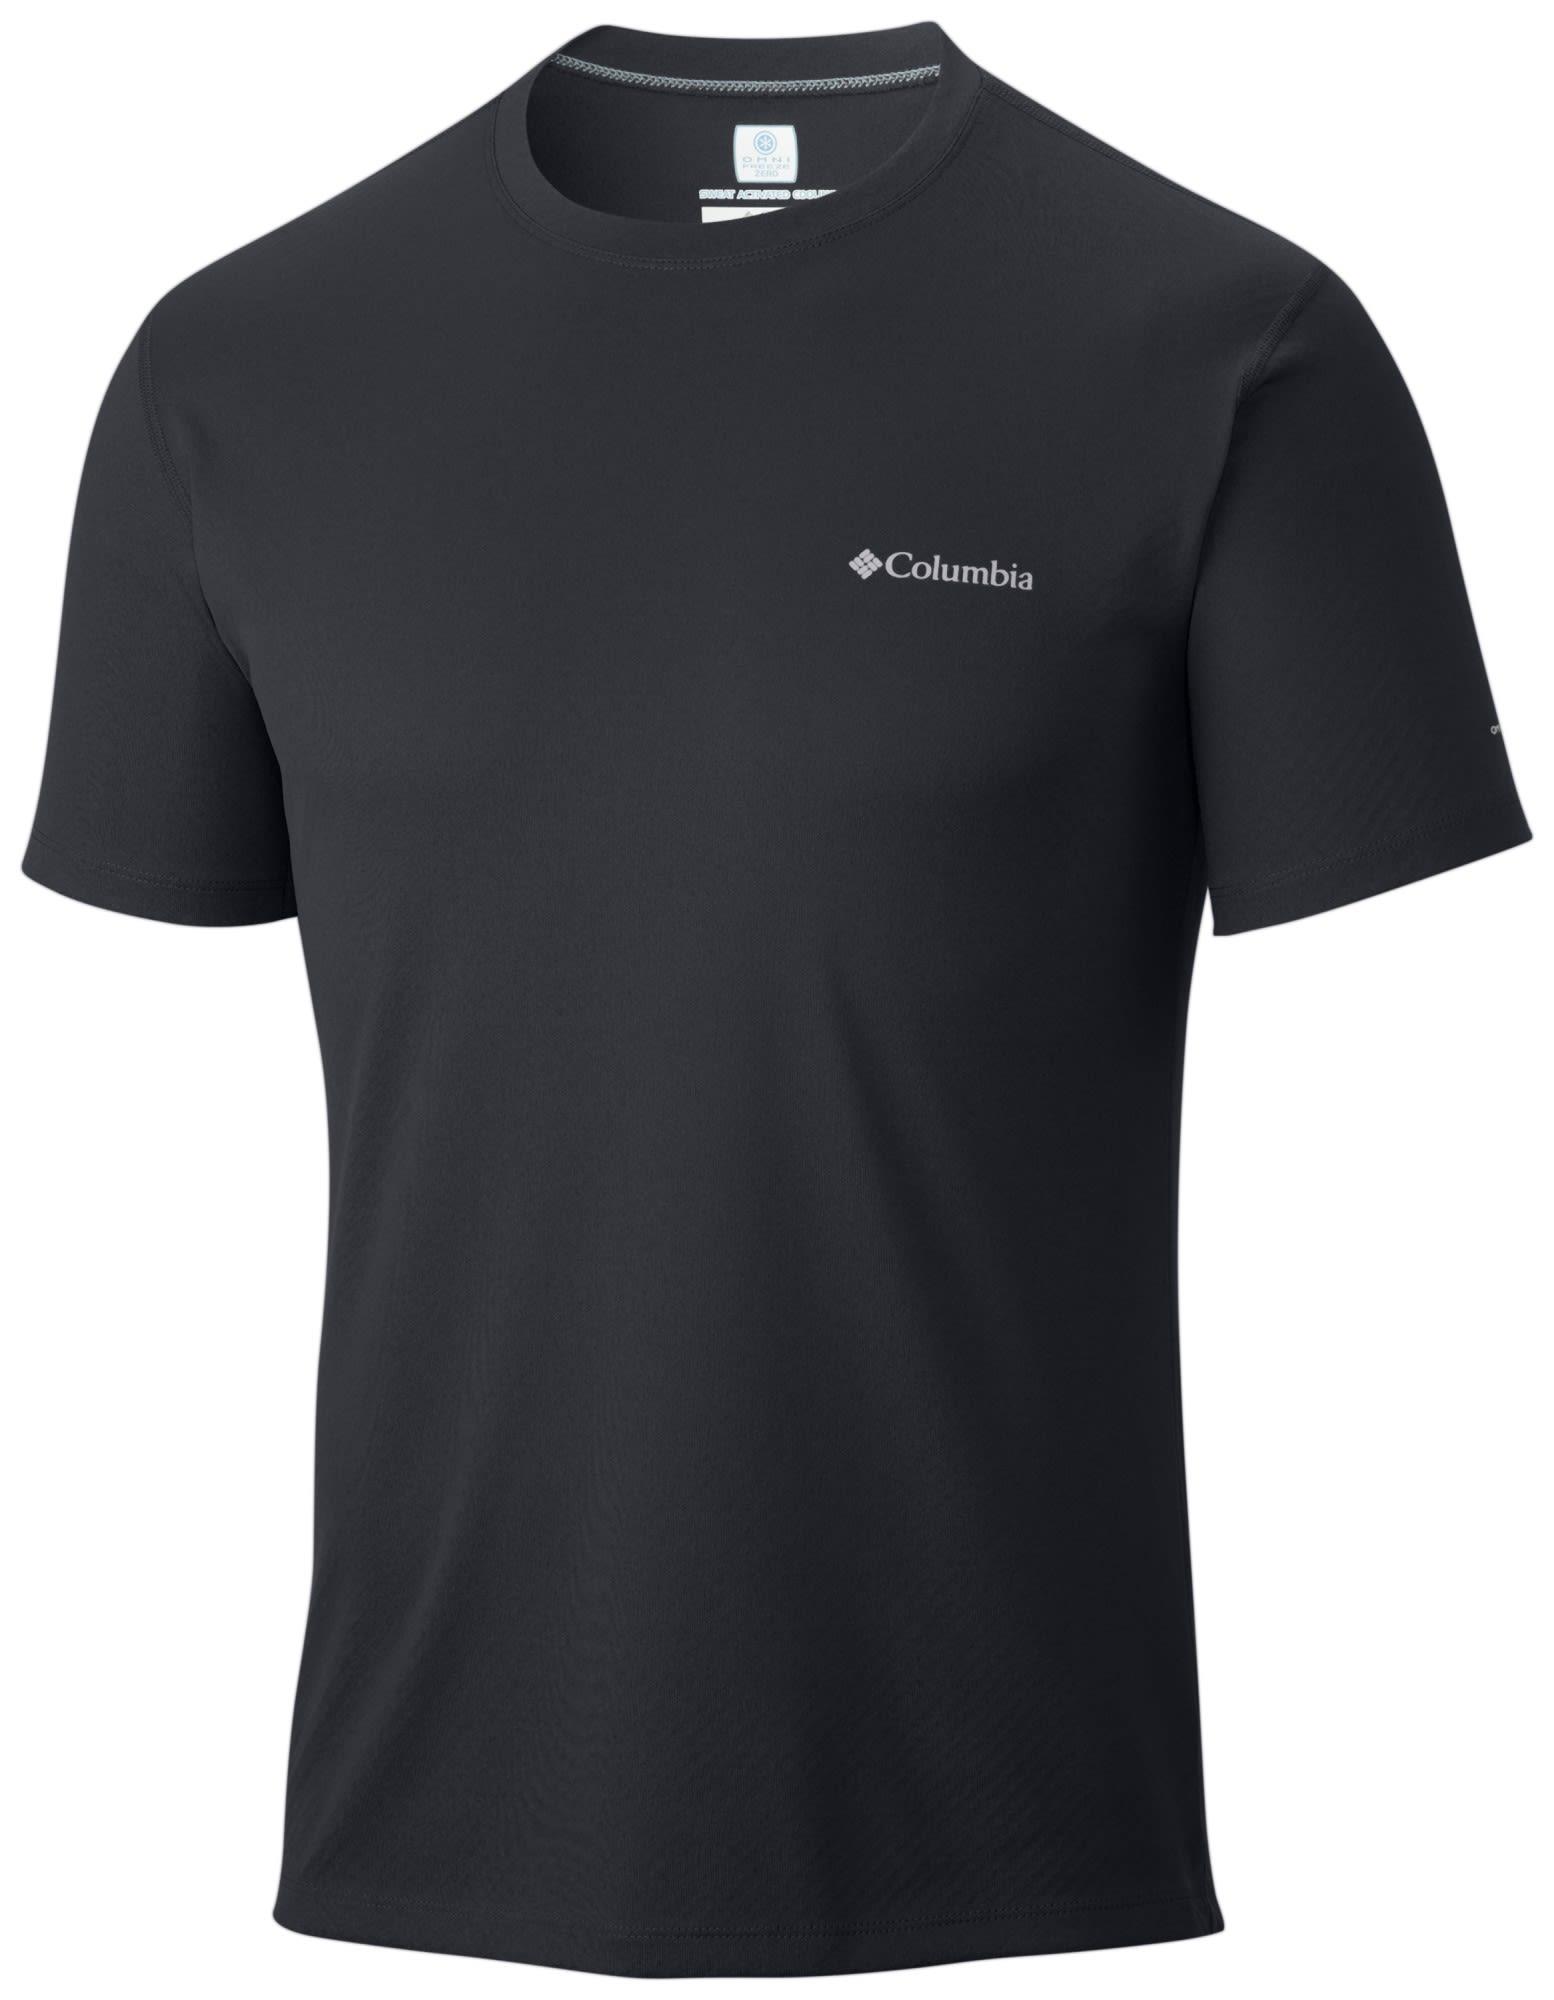 Columbia Zero Rules Short Sleeve Shirt Schwarz, Male Kurzarm-Shirt, M